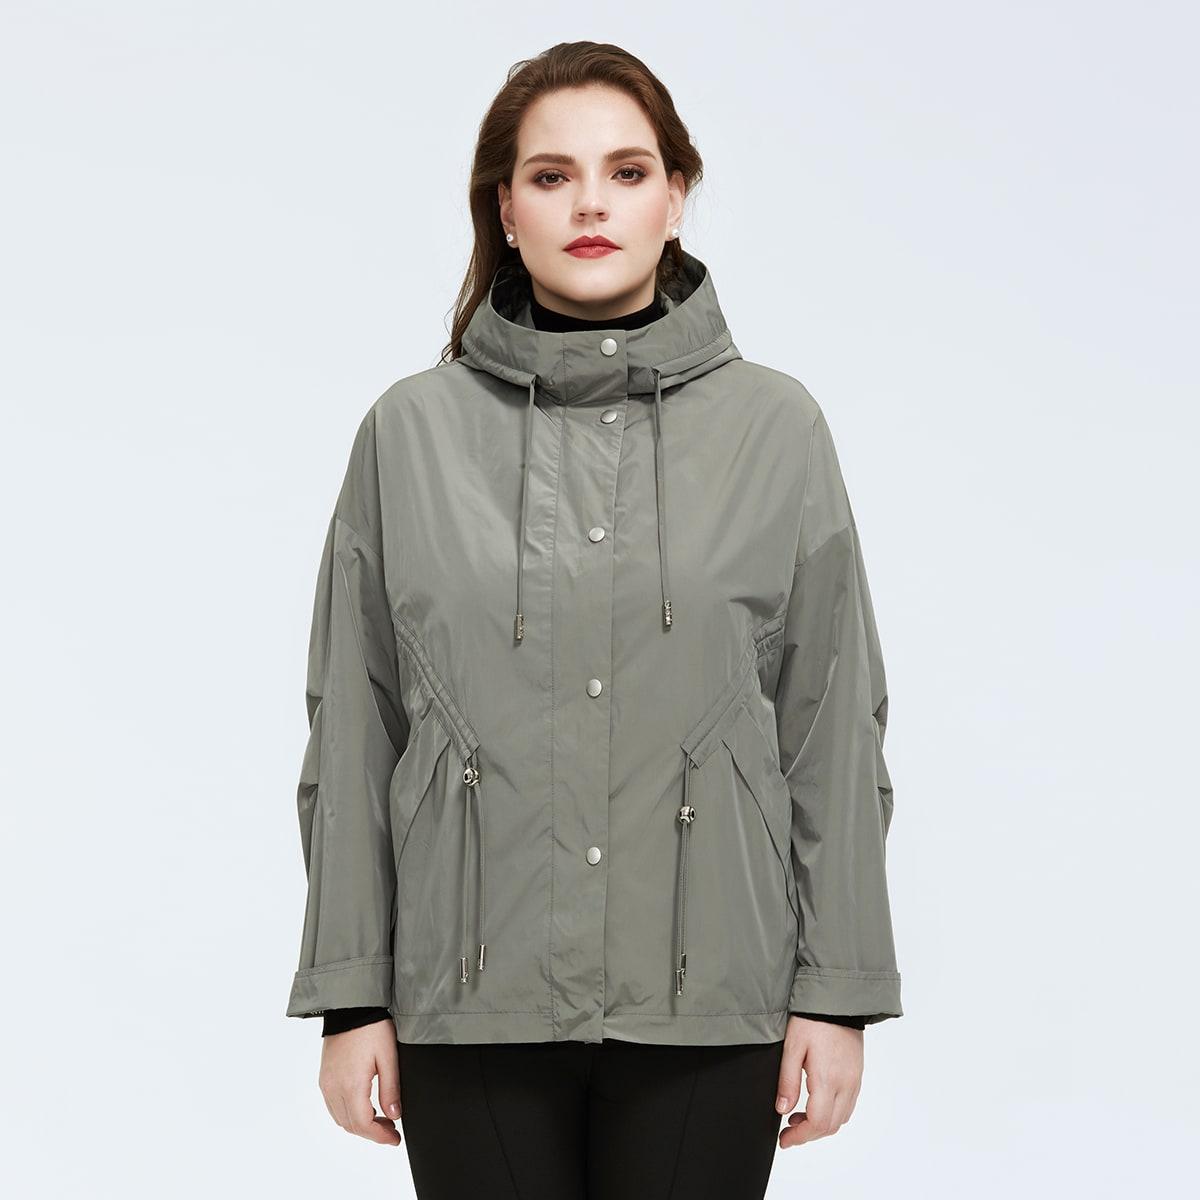 Astrid Plus Drawstring Waist Slant Pocket Hooded Wind Jacket